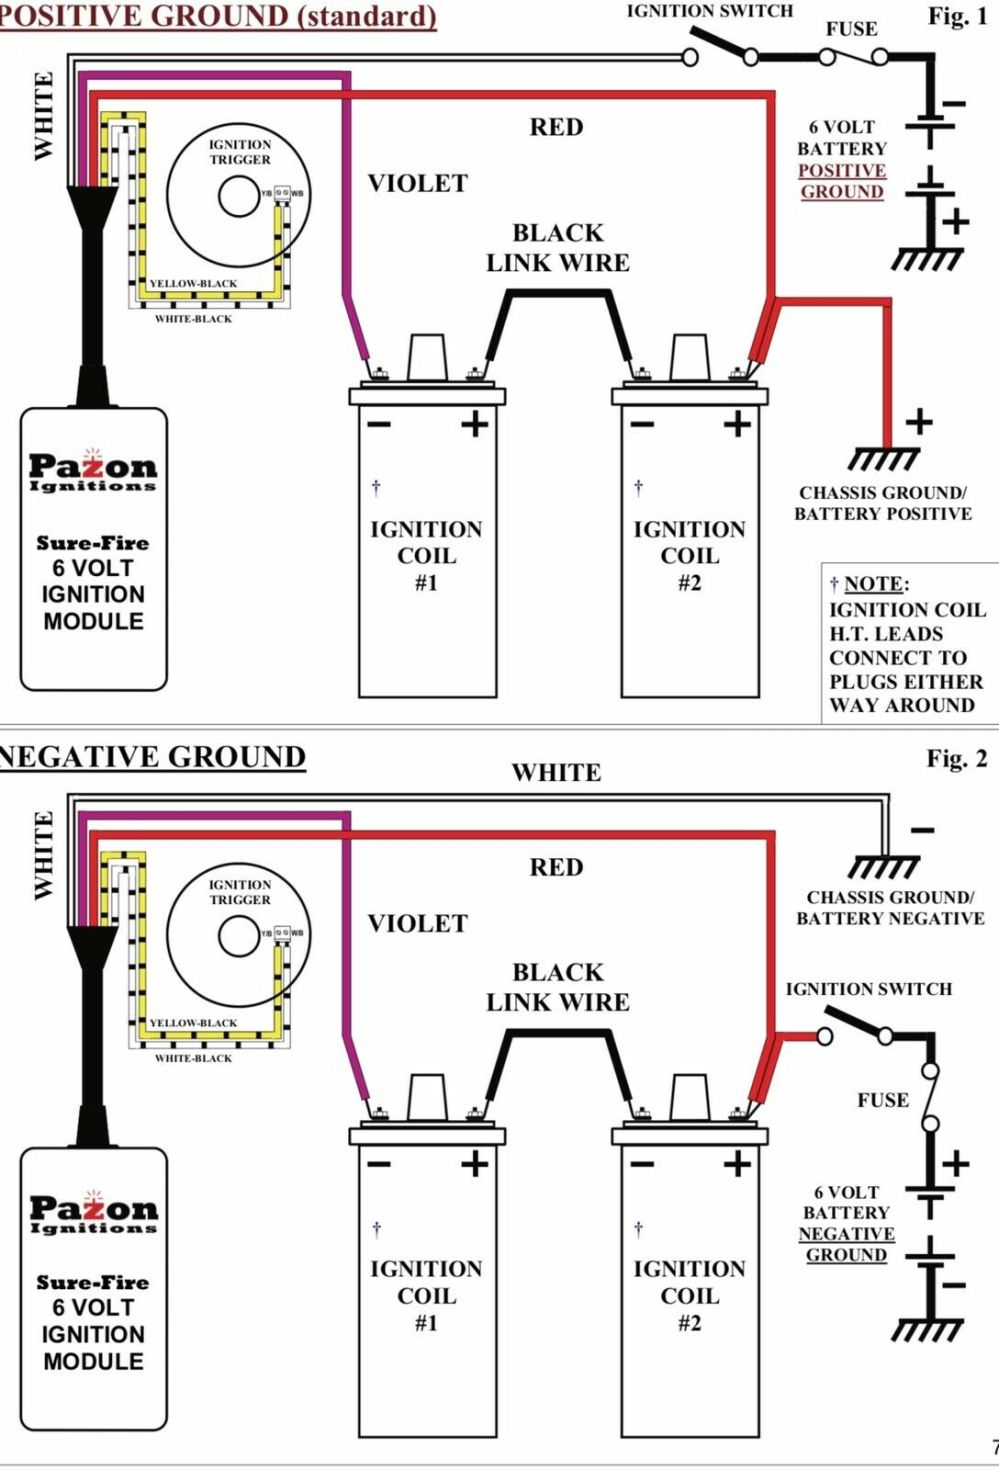 medium resolution of pazon wiring diagram wiring diagram pass pazon wiring diagram pazon electronic ignition twin cylinder triumph bsa